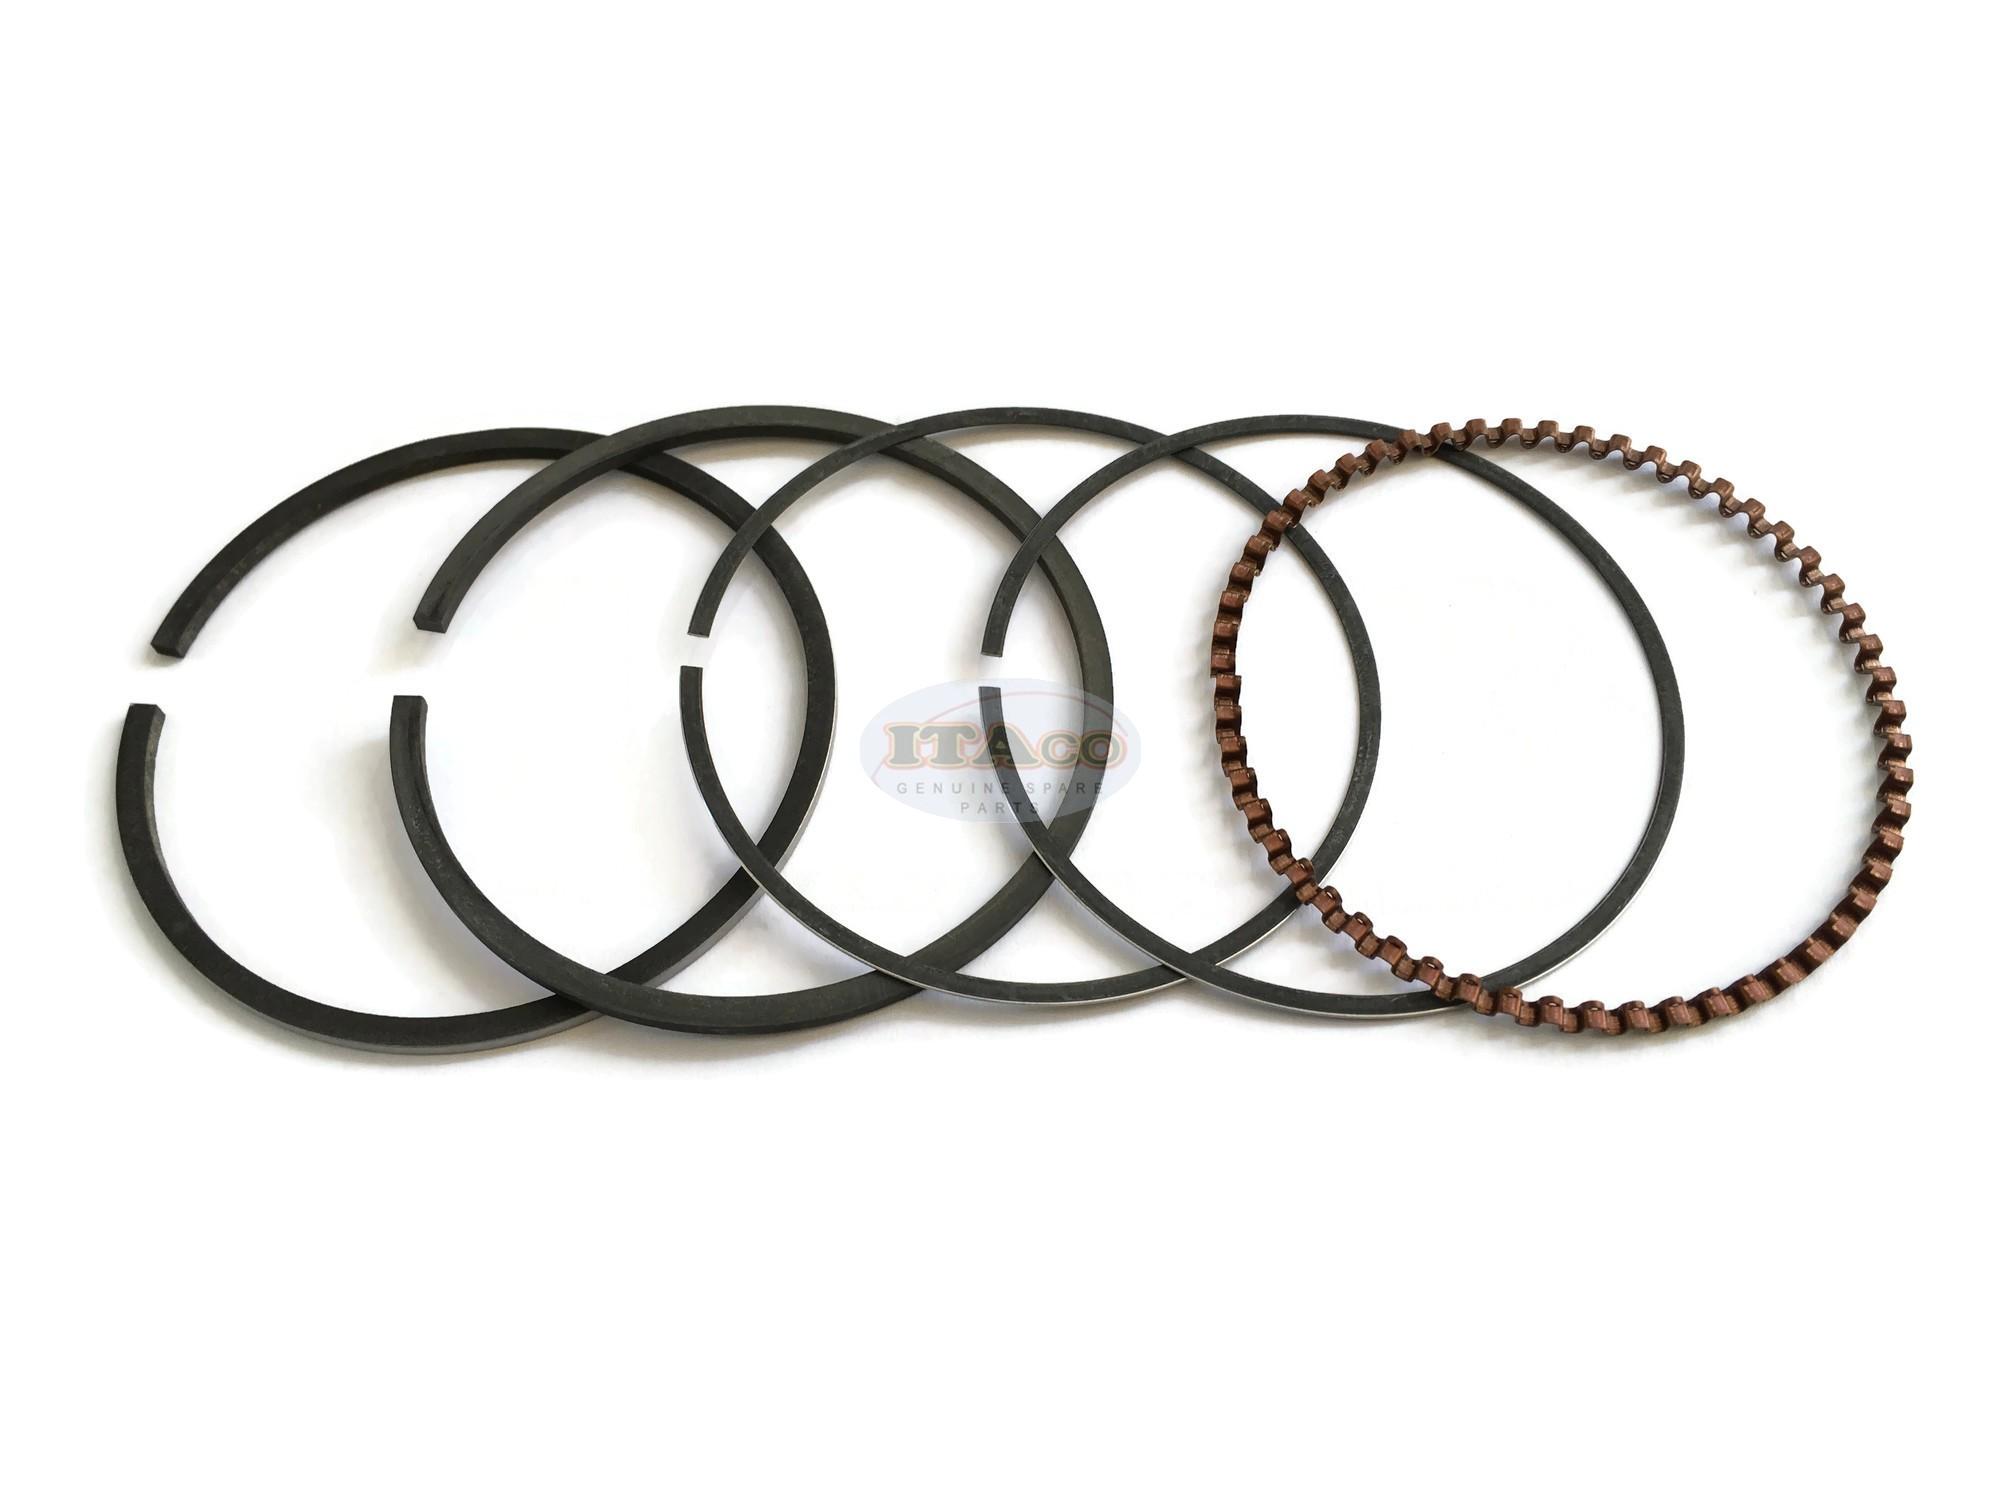 Piston Rings Ring Set std 227-23501-07 67mm for Robin Subaru EY20 EH18 5HP Motor Trimmer Lawnmower Engine